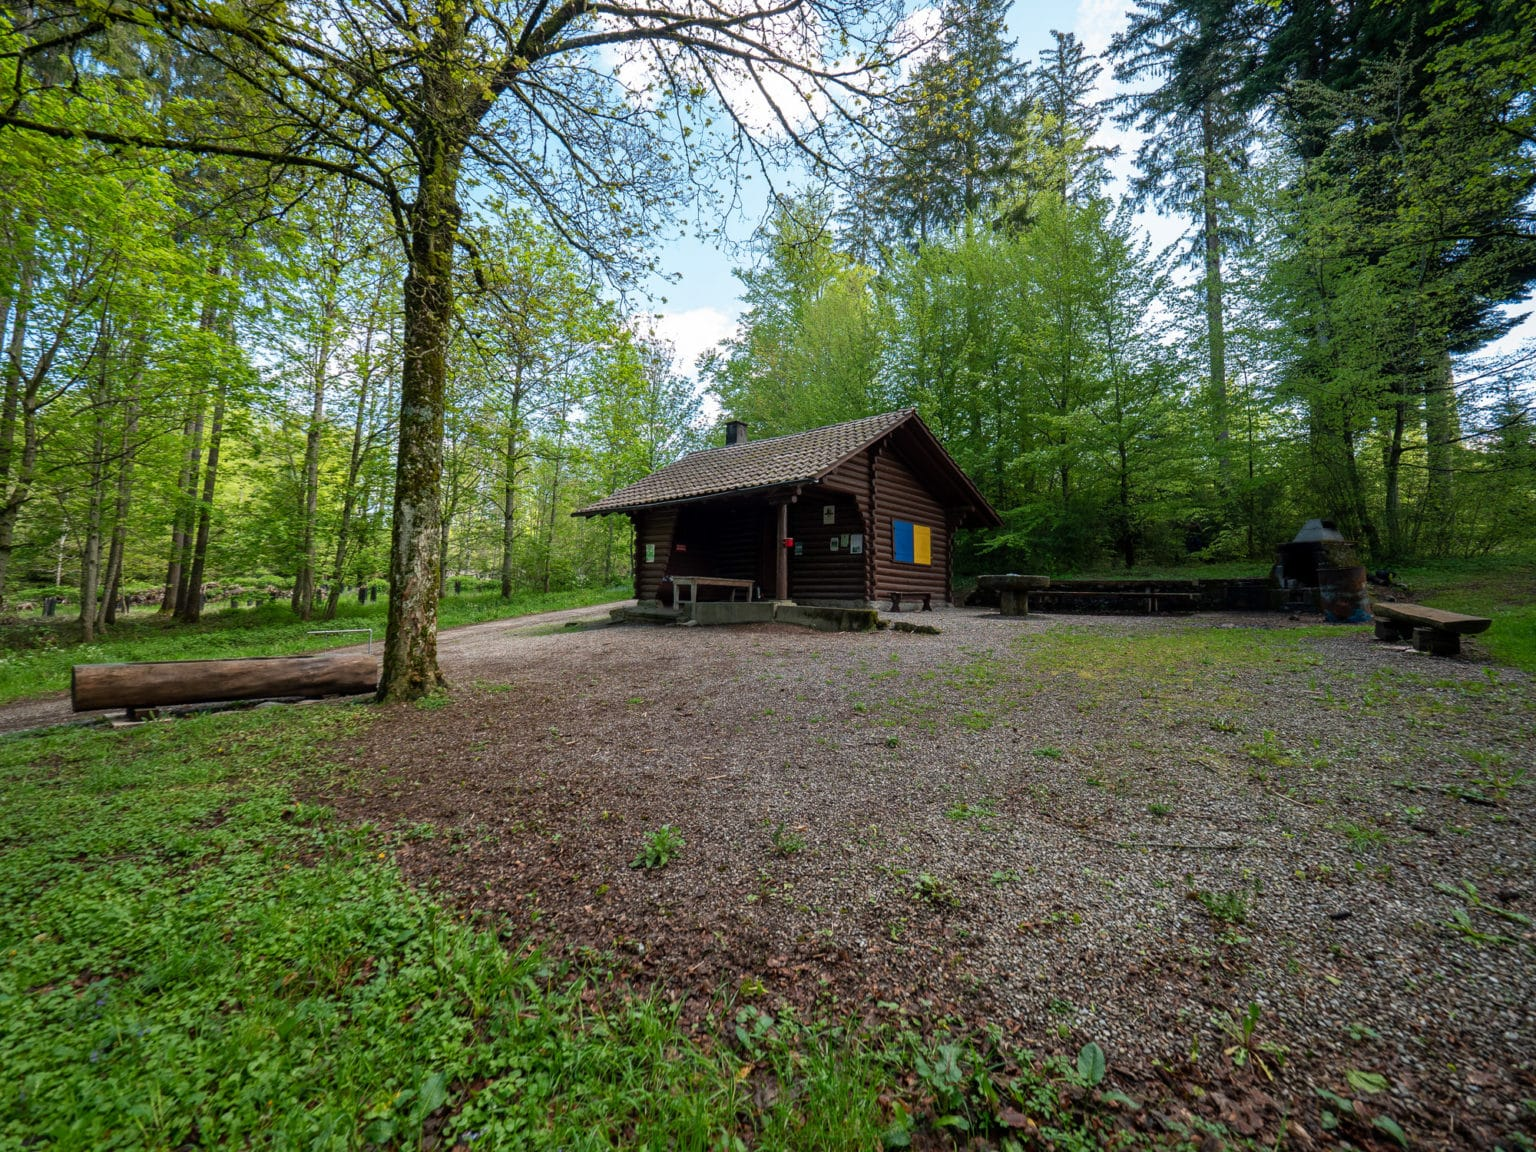 Refuges-salles-Montanaire©V-Dubach-52589